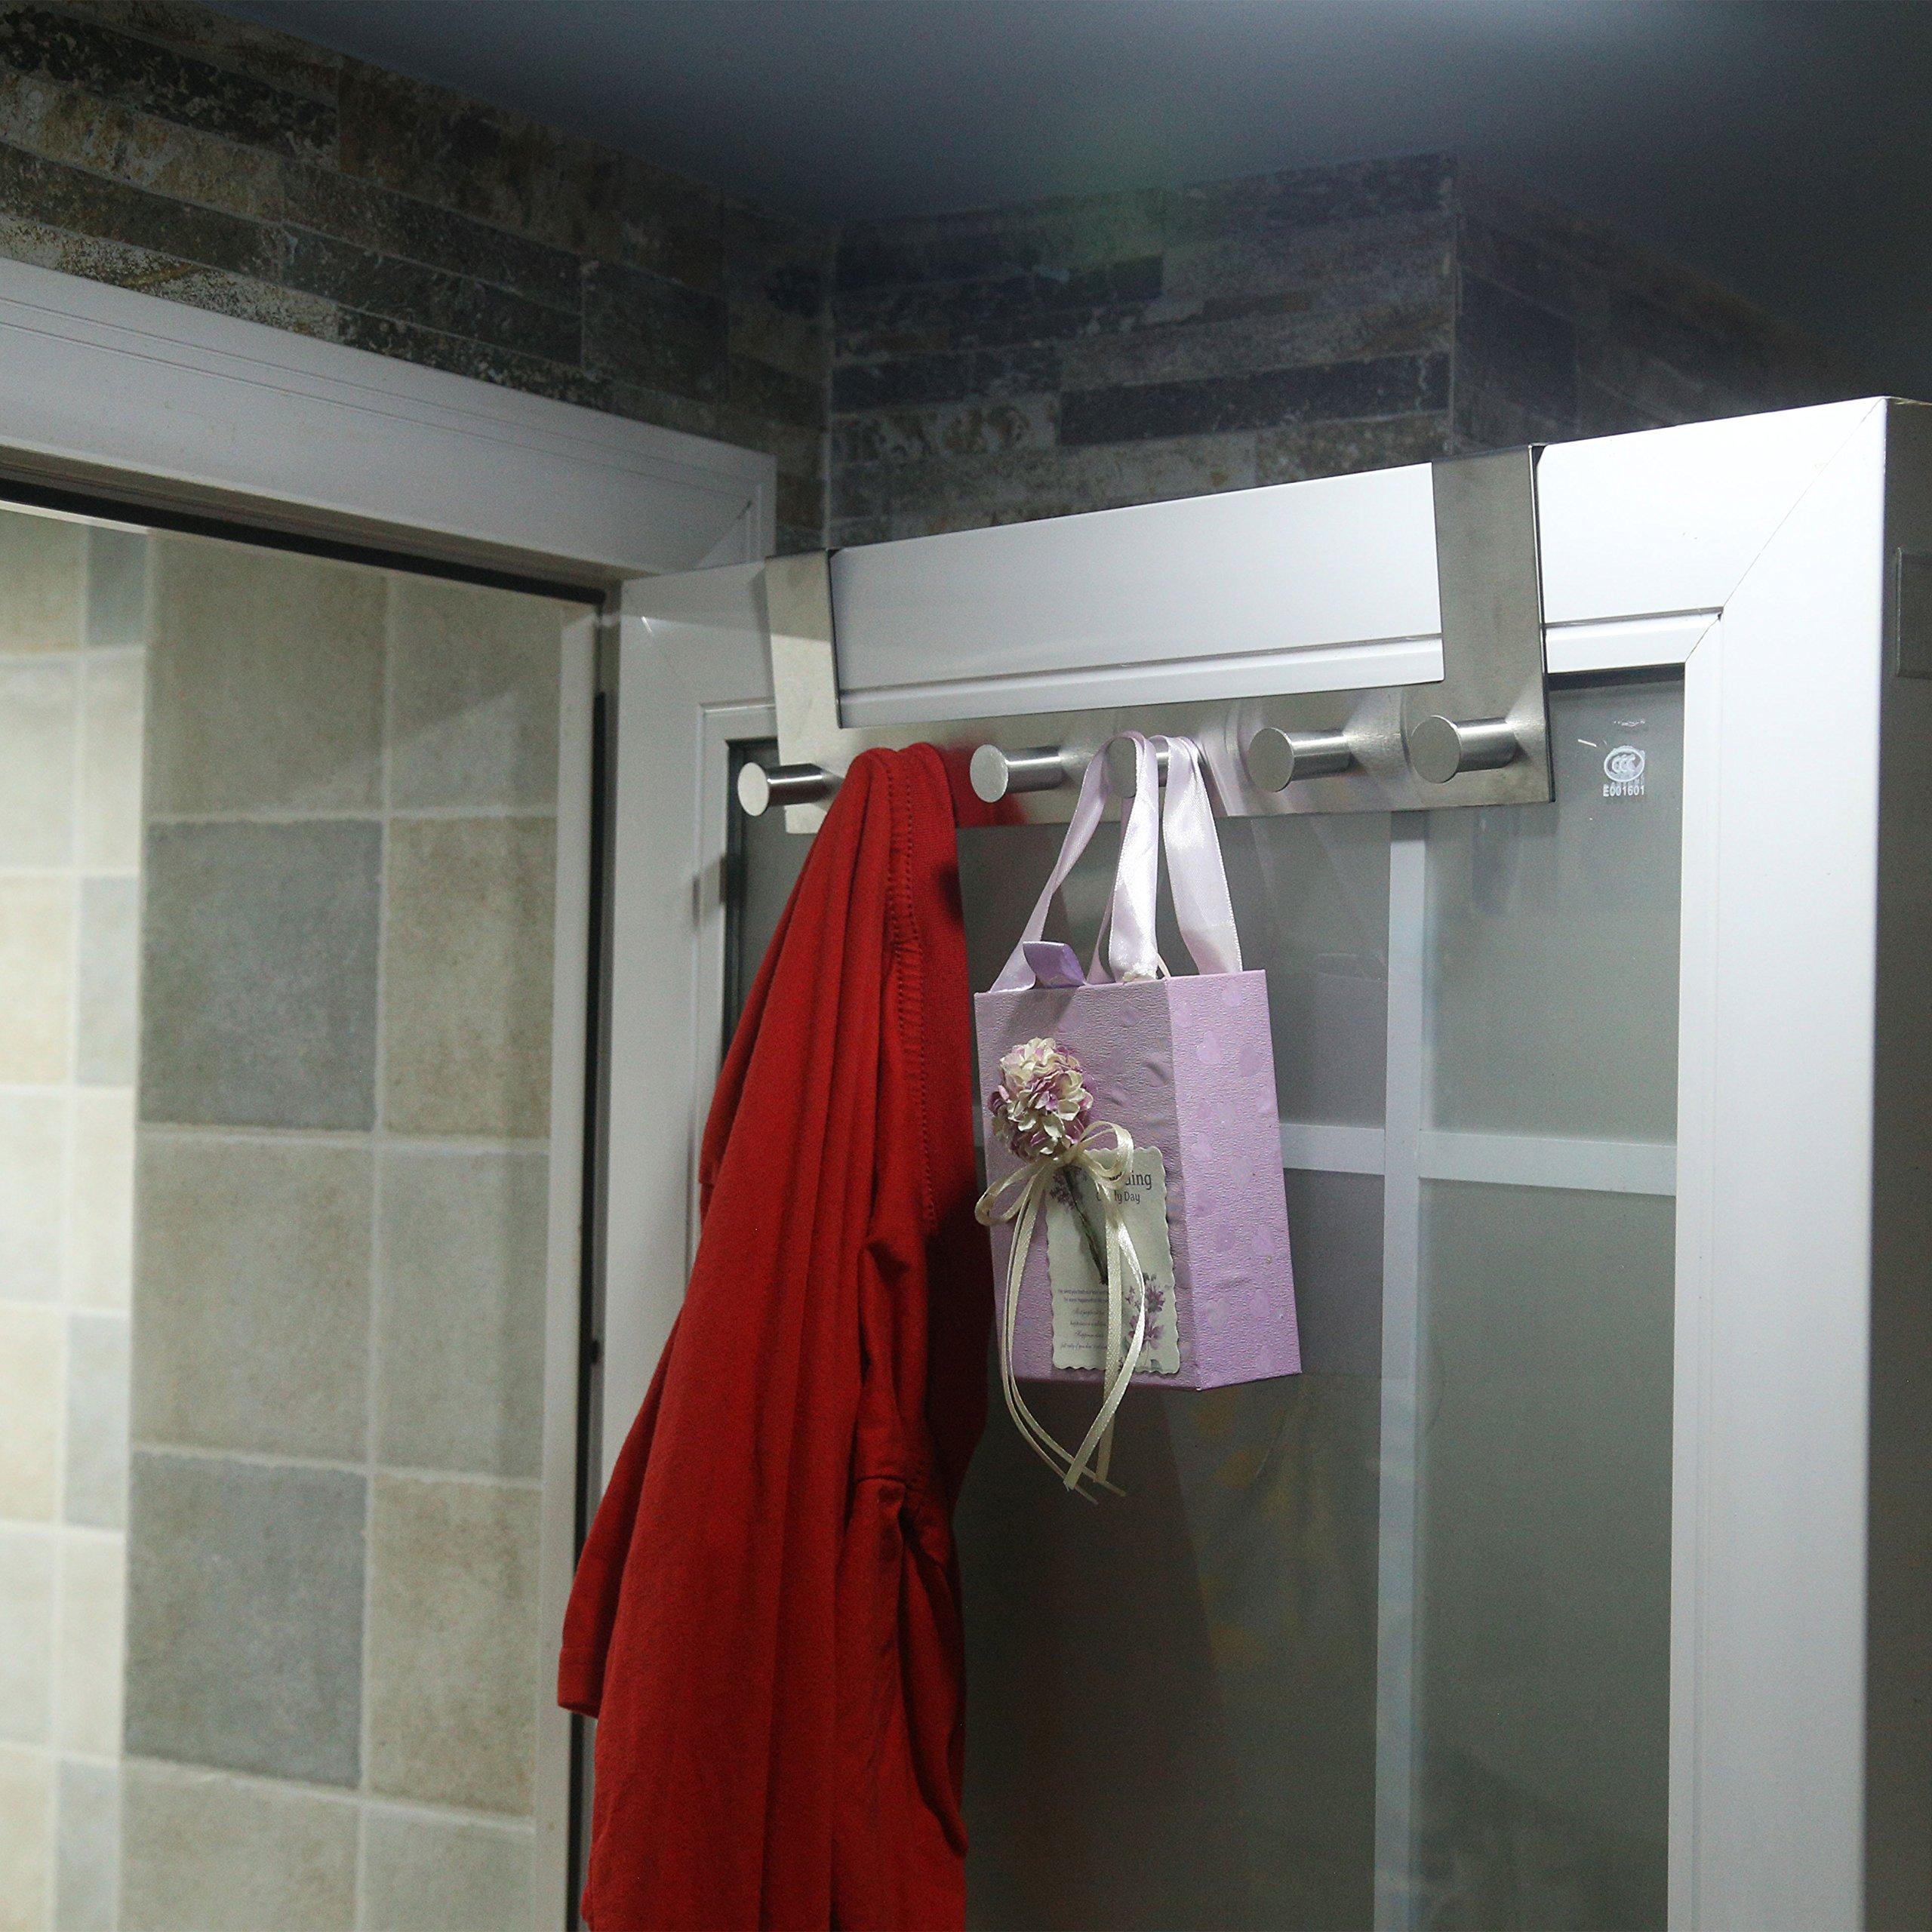 WEBI Over-The-Door Hooks : Modern, Heavy Duty, Anti-Rust, Clou Door Hanger,6 Coat Hook Pegs, Towel Holder, Utility for Coats, Towel, Hats, Bags, Scarves, Purse (6 Pegs, Stainless Steel,Satin,2 Packs) by WEBI (Image #8)